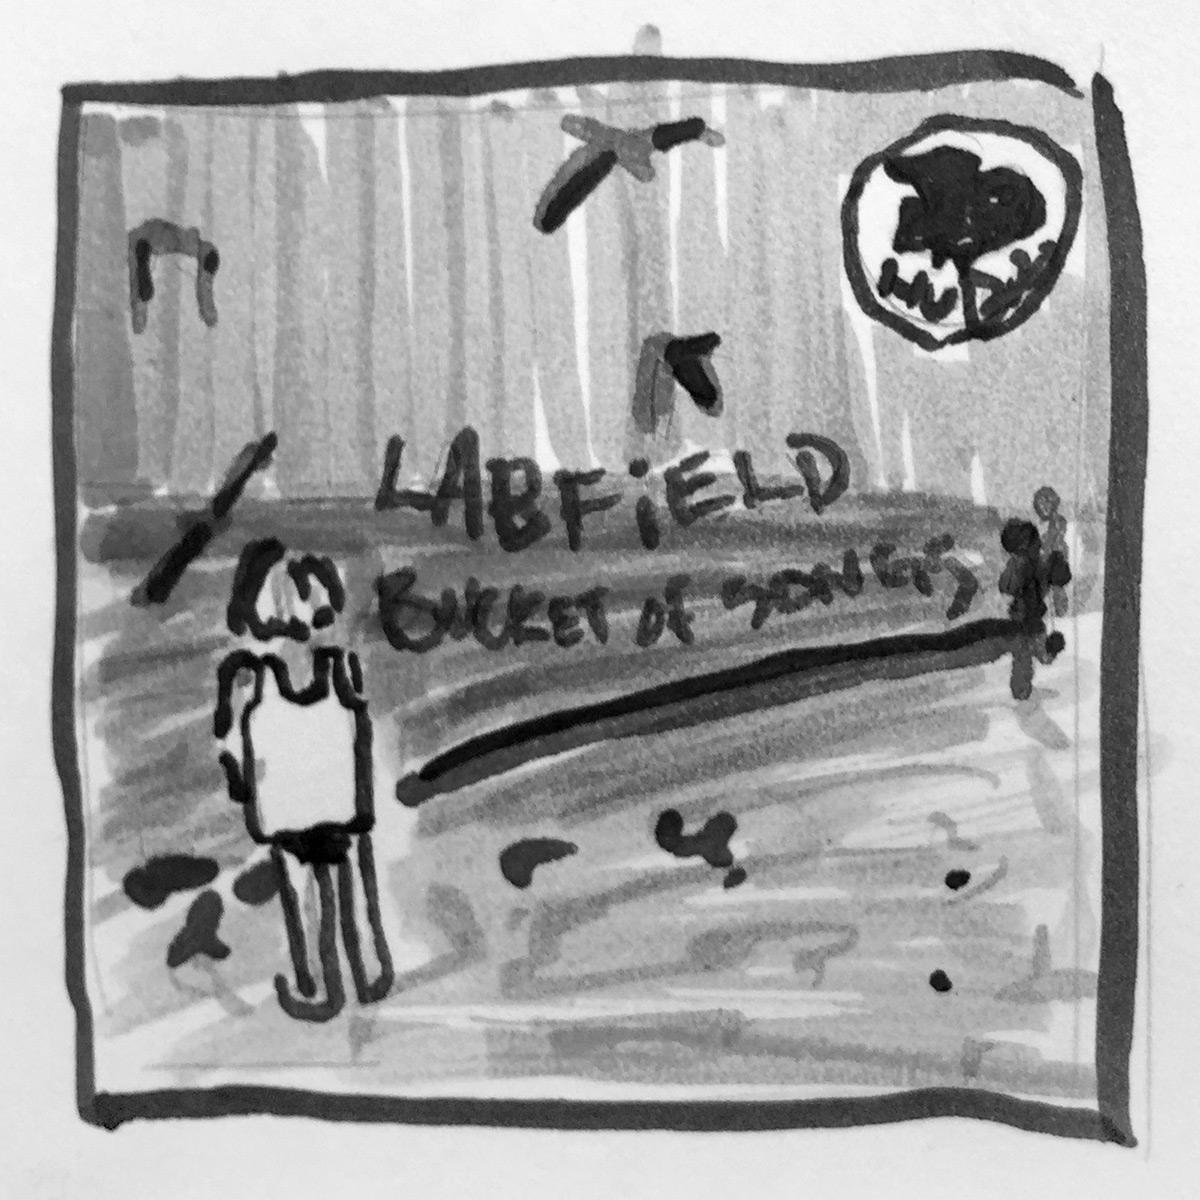 Labfield